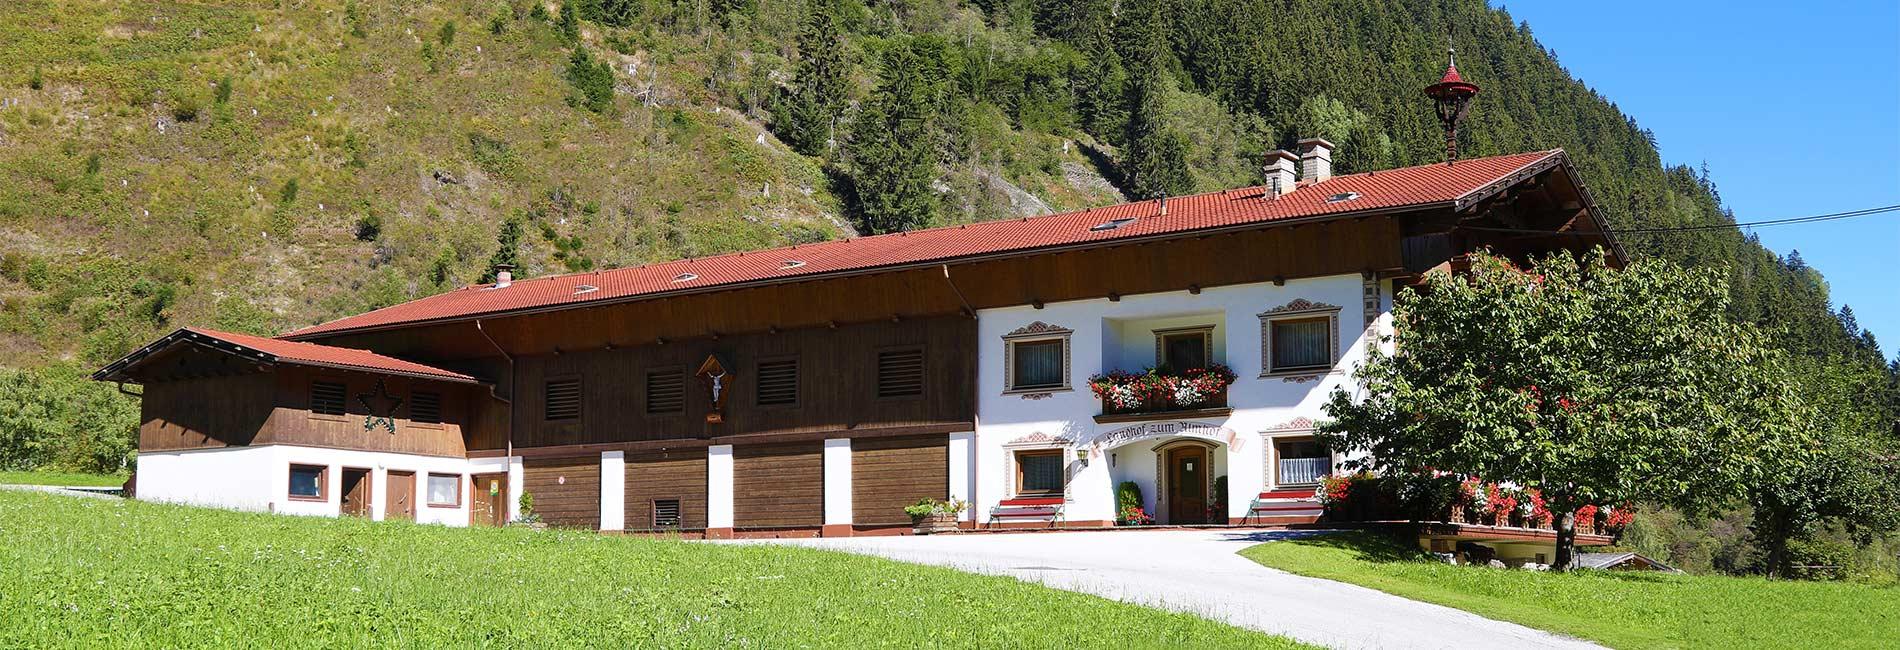 Bauernhof Hotel Neustift Milders Stubaital Tirol